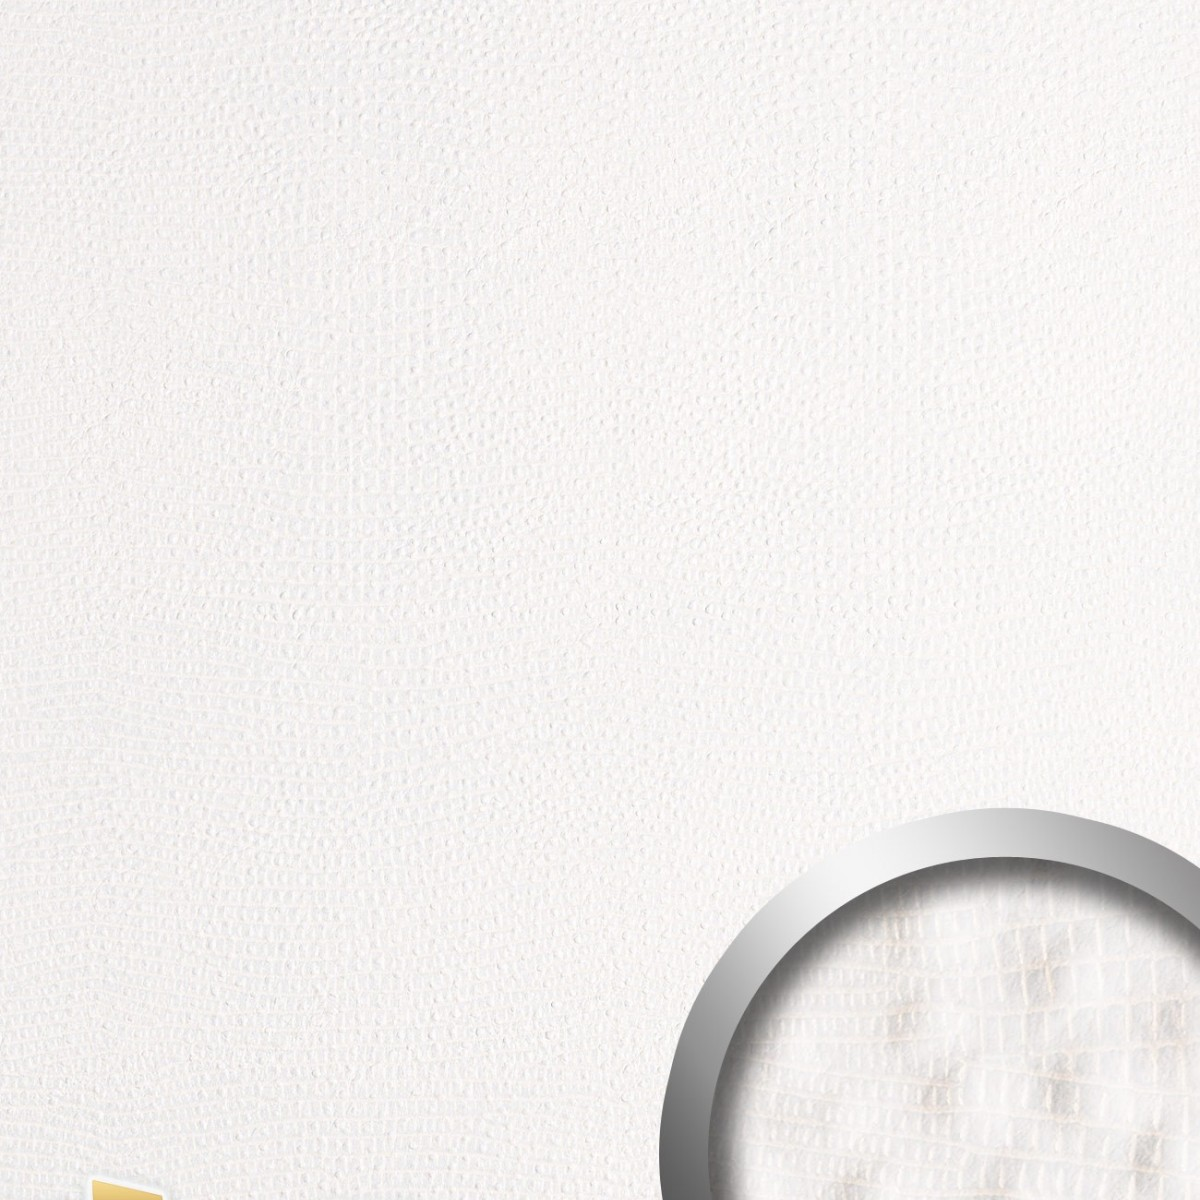 Panou decorativ LEATHER 13400, WallFace, autocolant